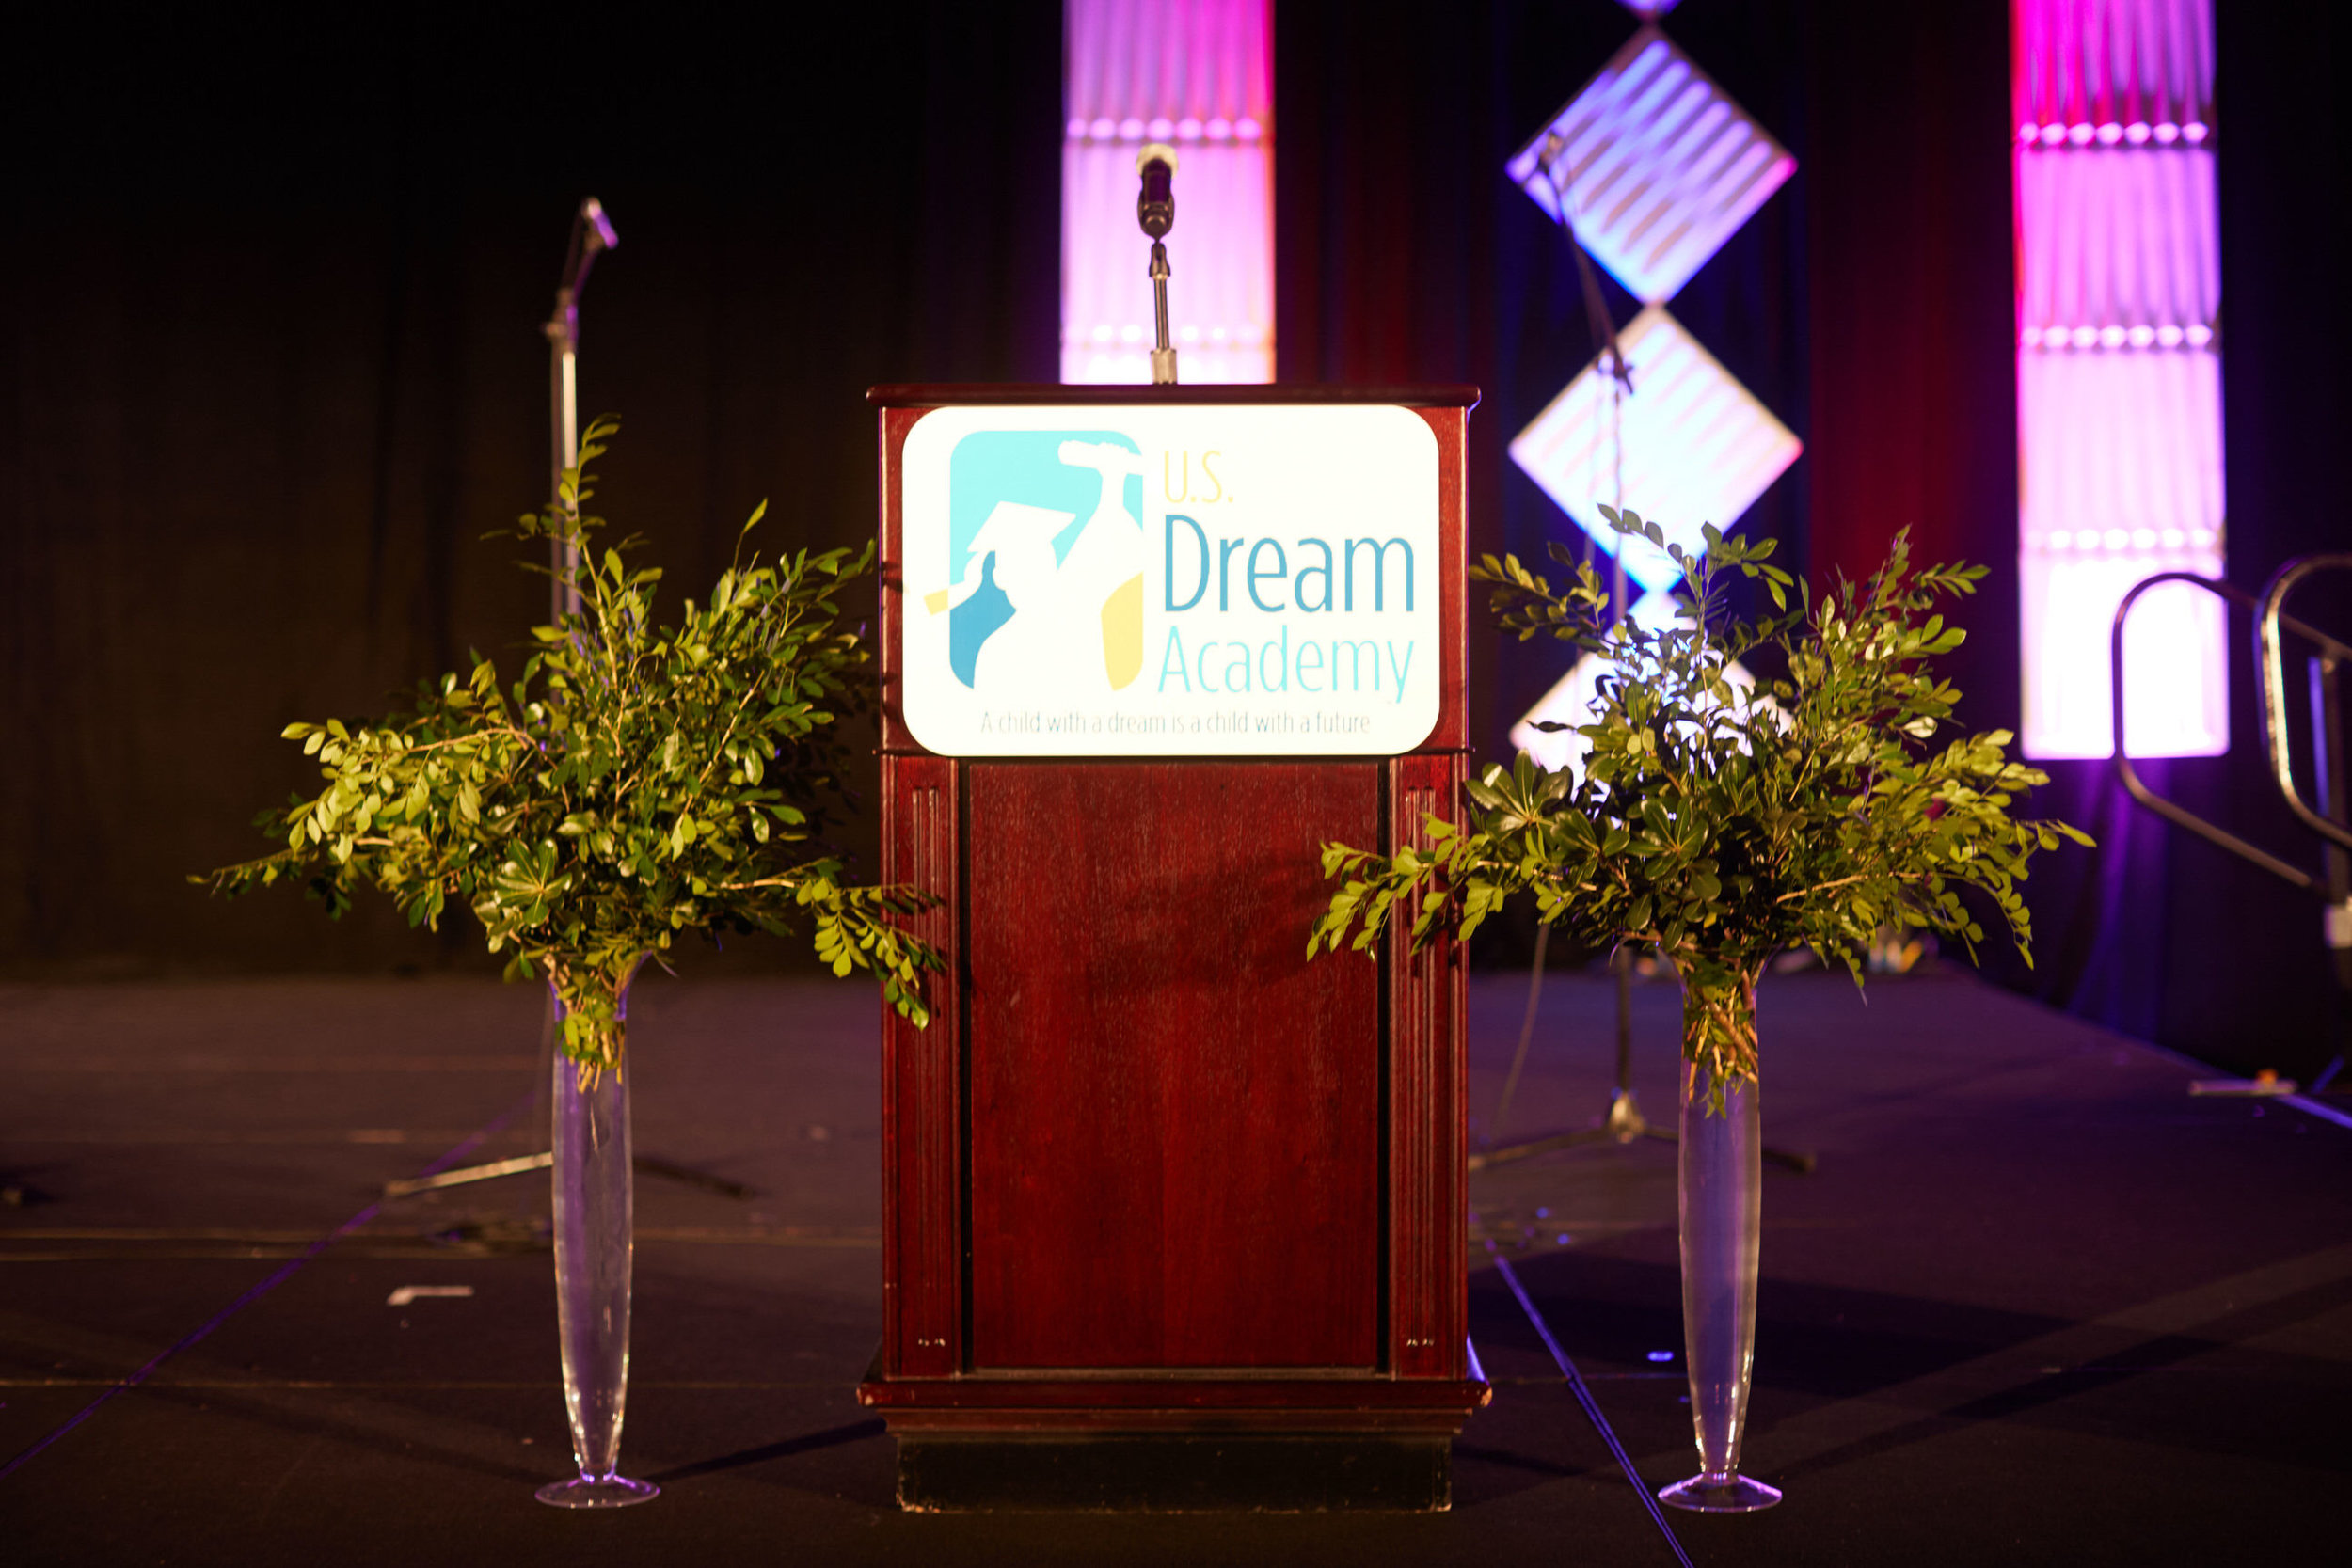 fundraising gala - US Dream Academy